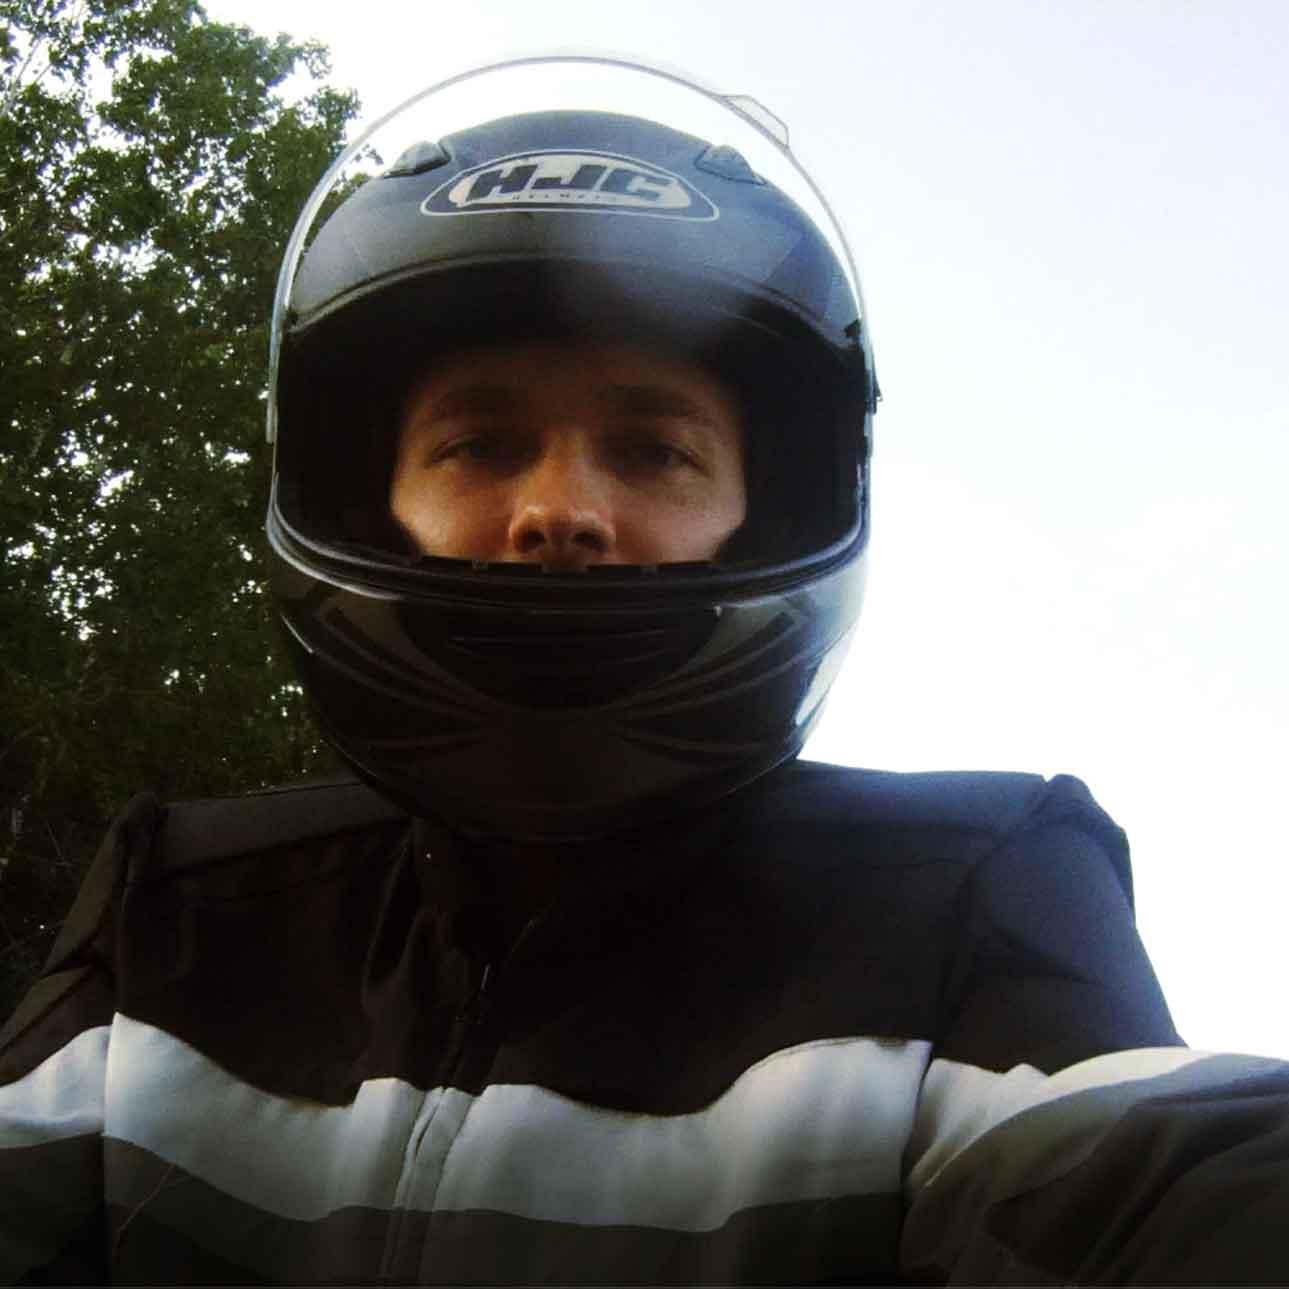 Karr motorcycling